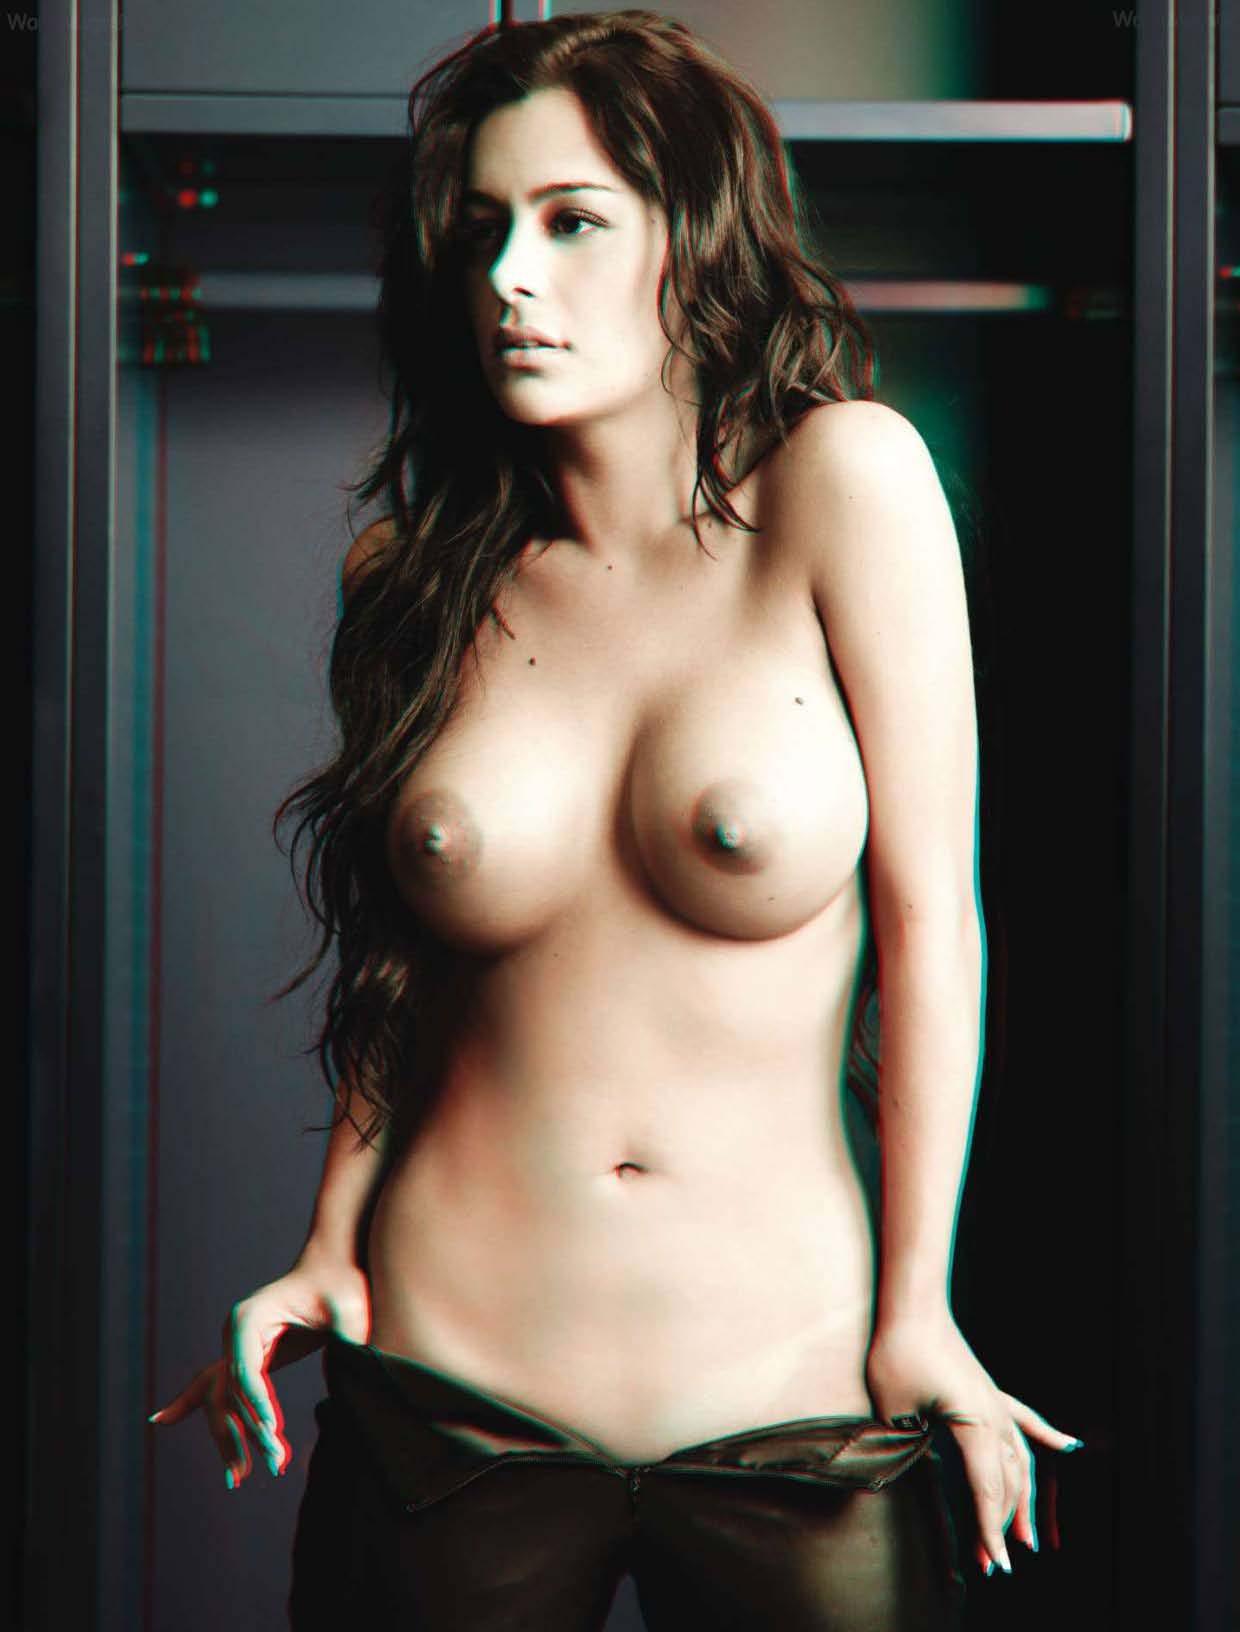 50989_septimiu29_LarissaRiquelme_PlayboyBrazil_Sep201020_123_41lo.jpg